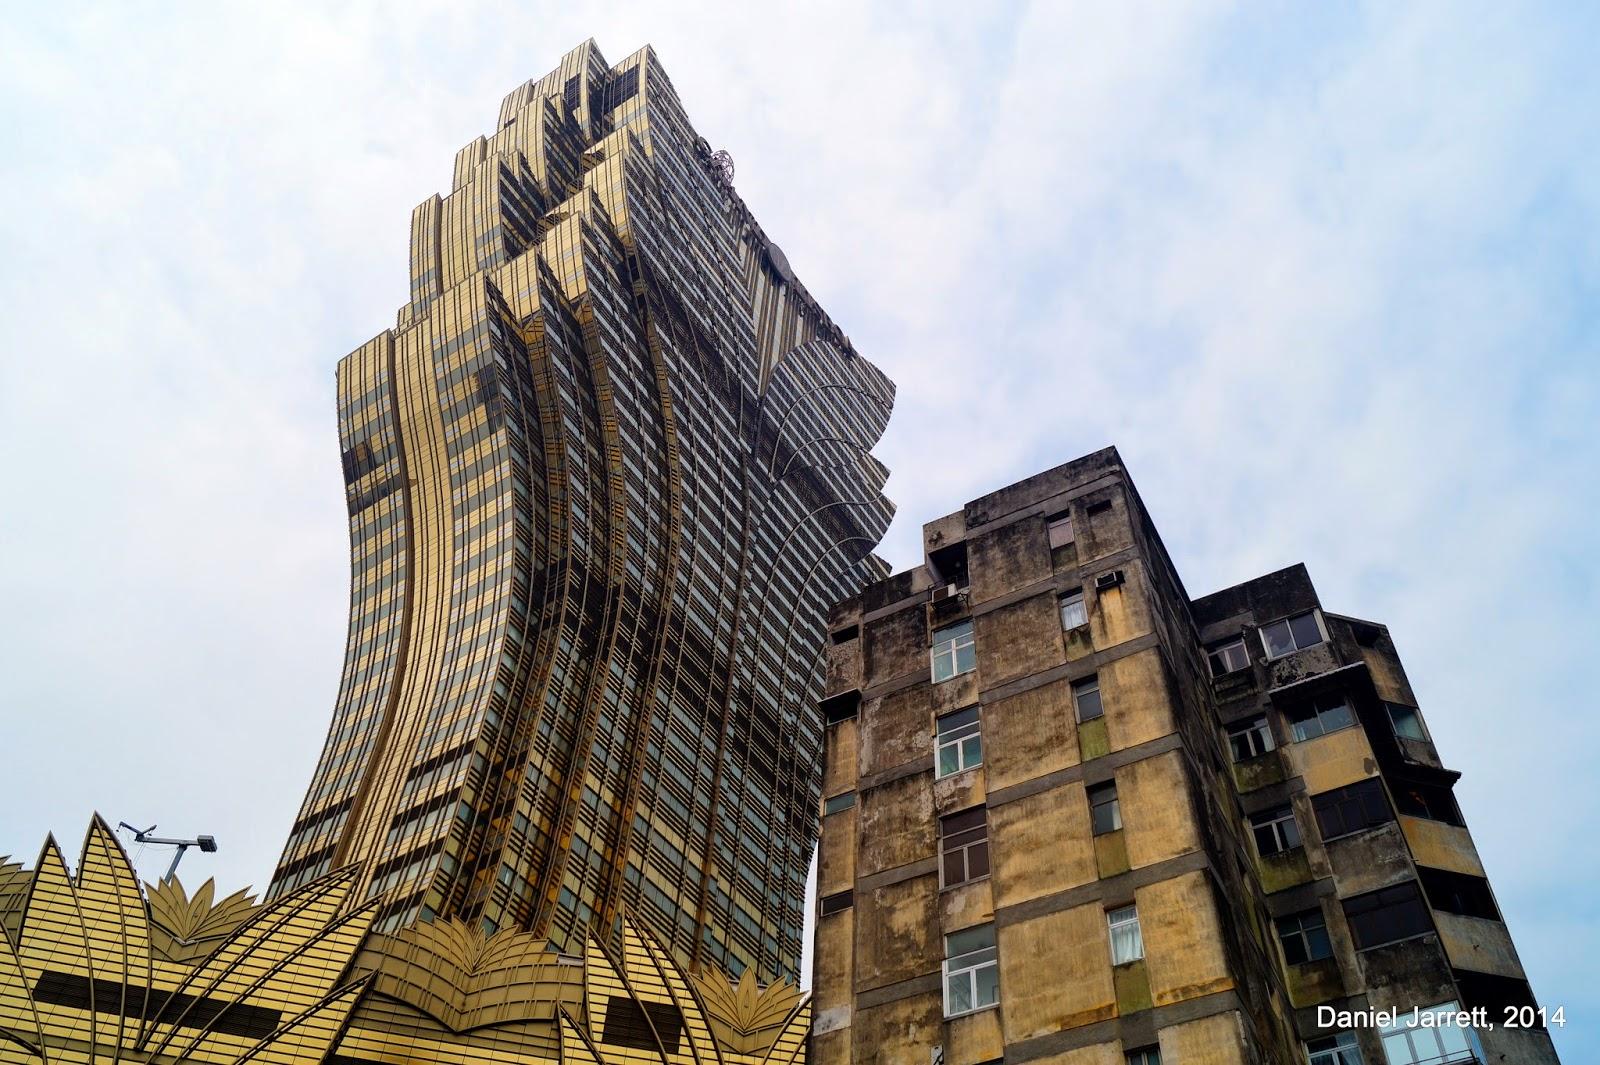 Macau Grand Lisboa Hotel